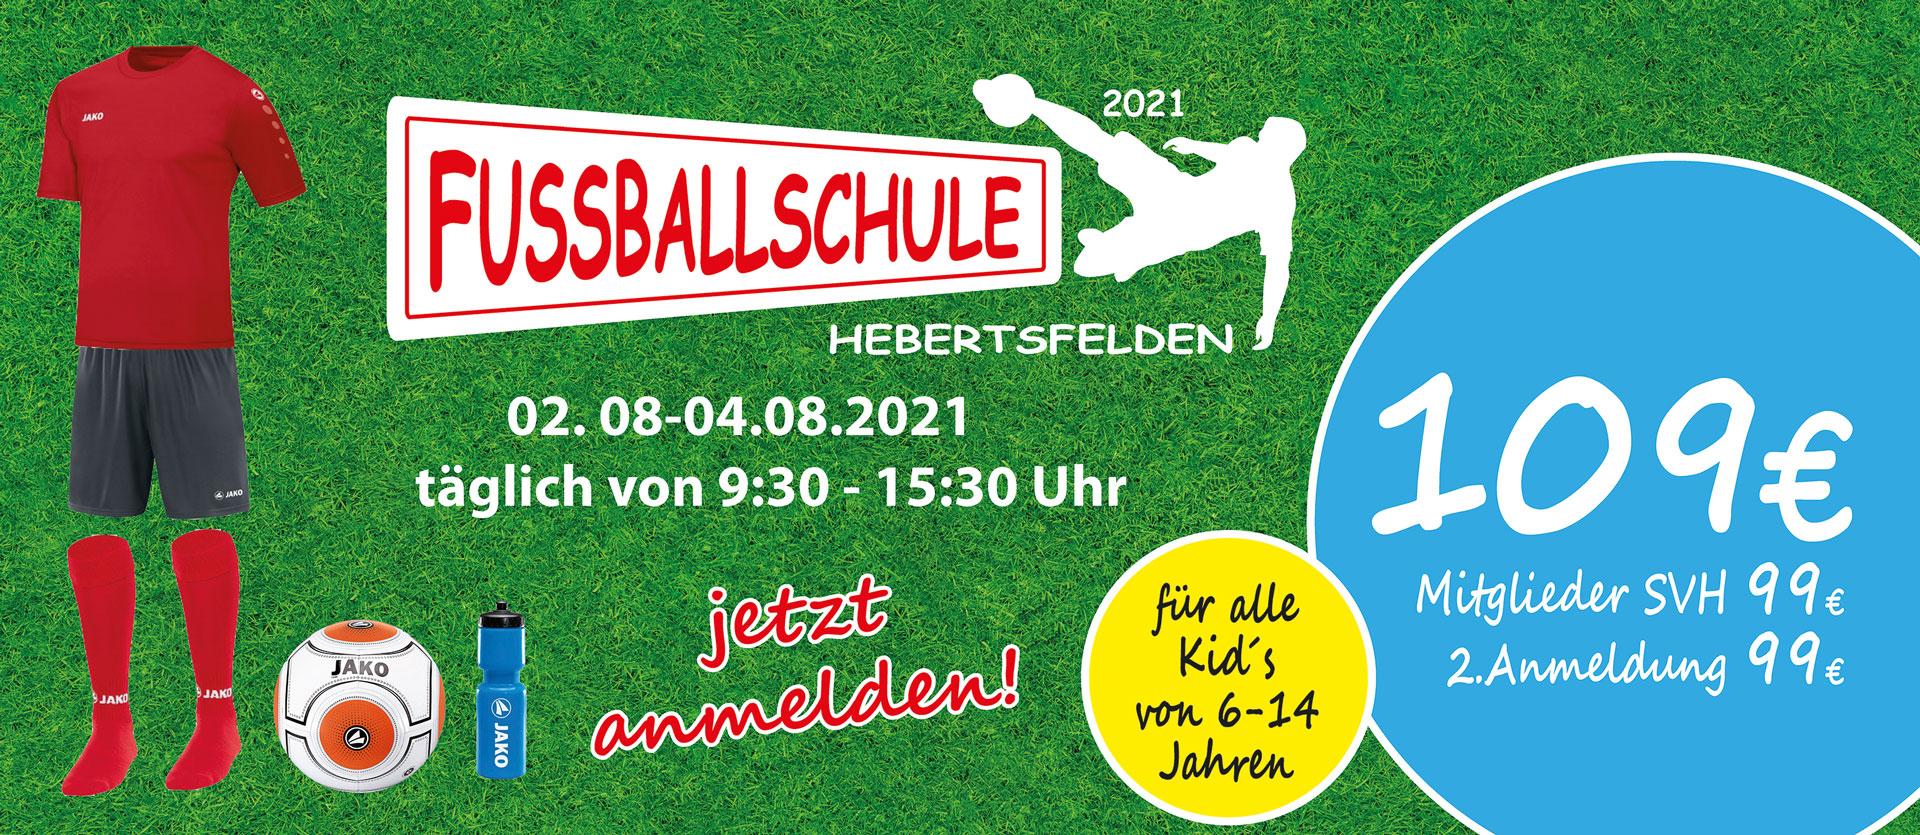 Header-Fussballschule2021_1920px_Q60